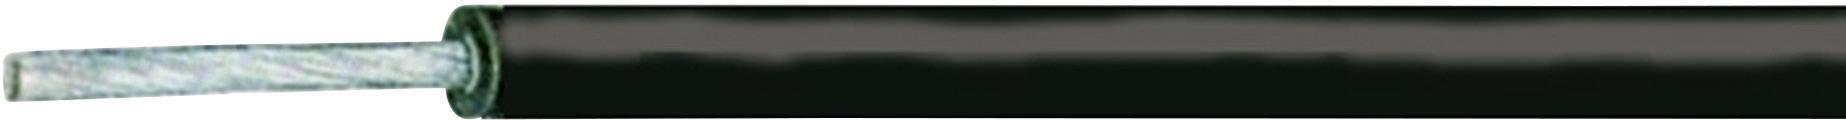 Stikalna žica SiL-SiAF 1 x 4 mm, zelena, rumena XBK Kabel cena za meter